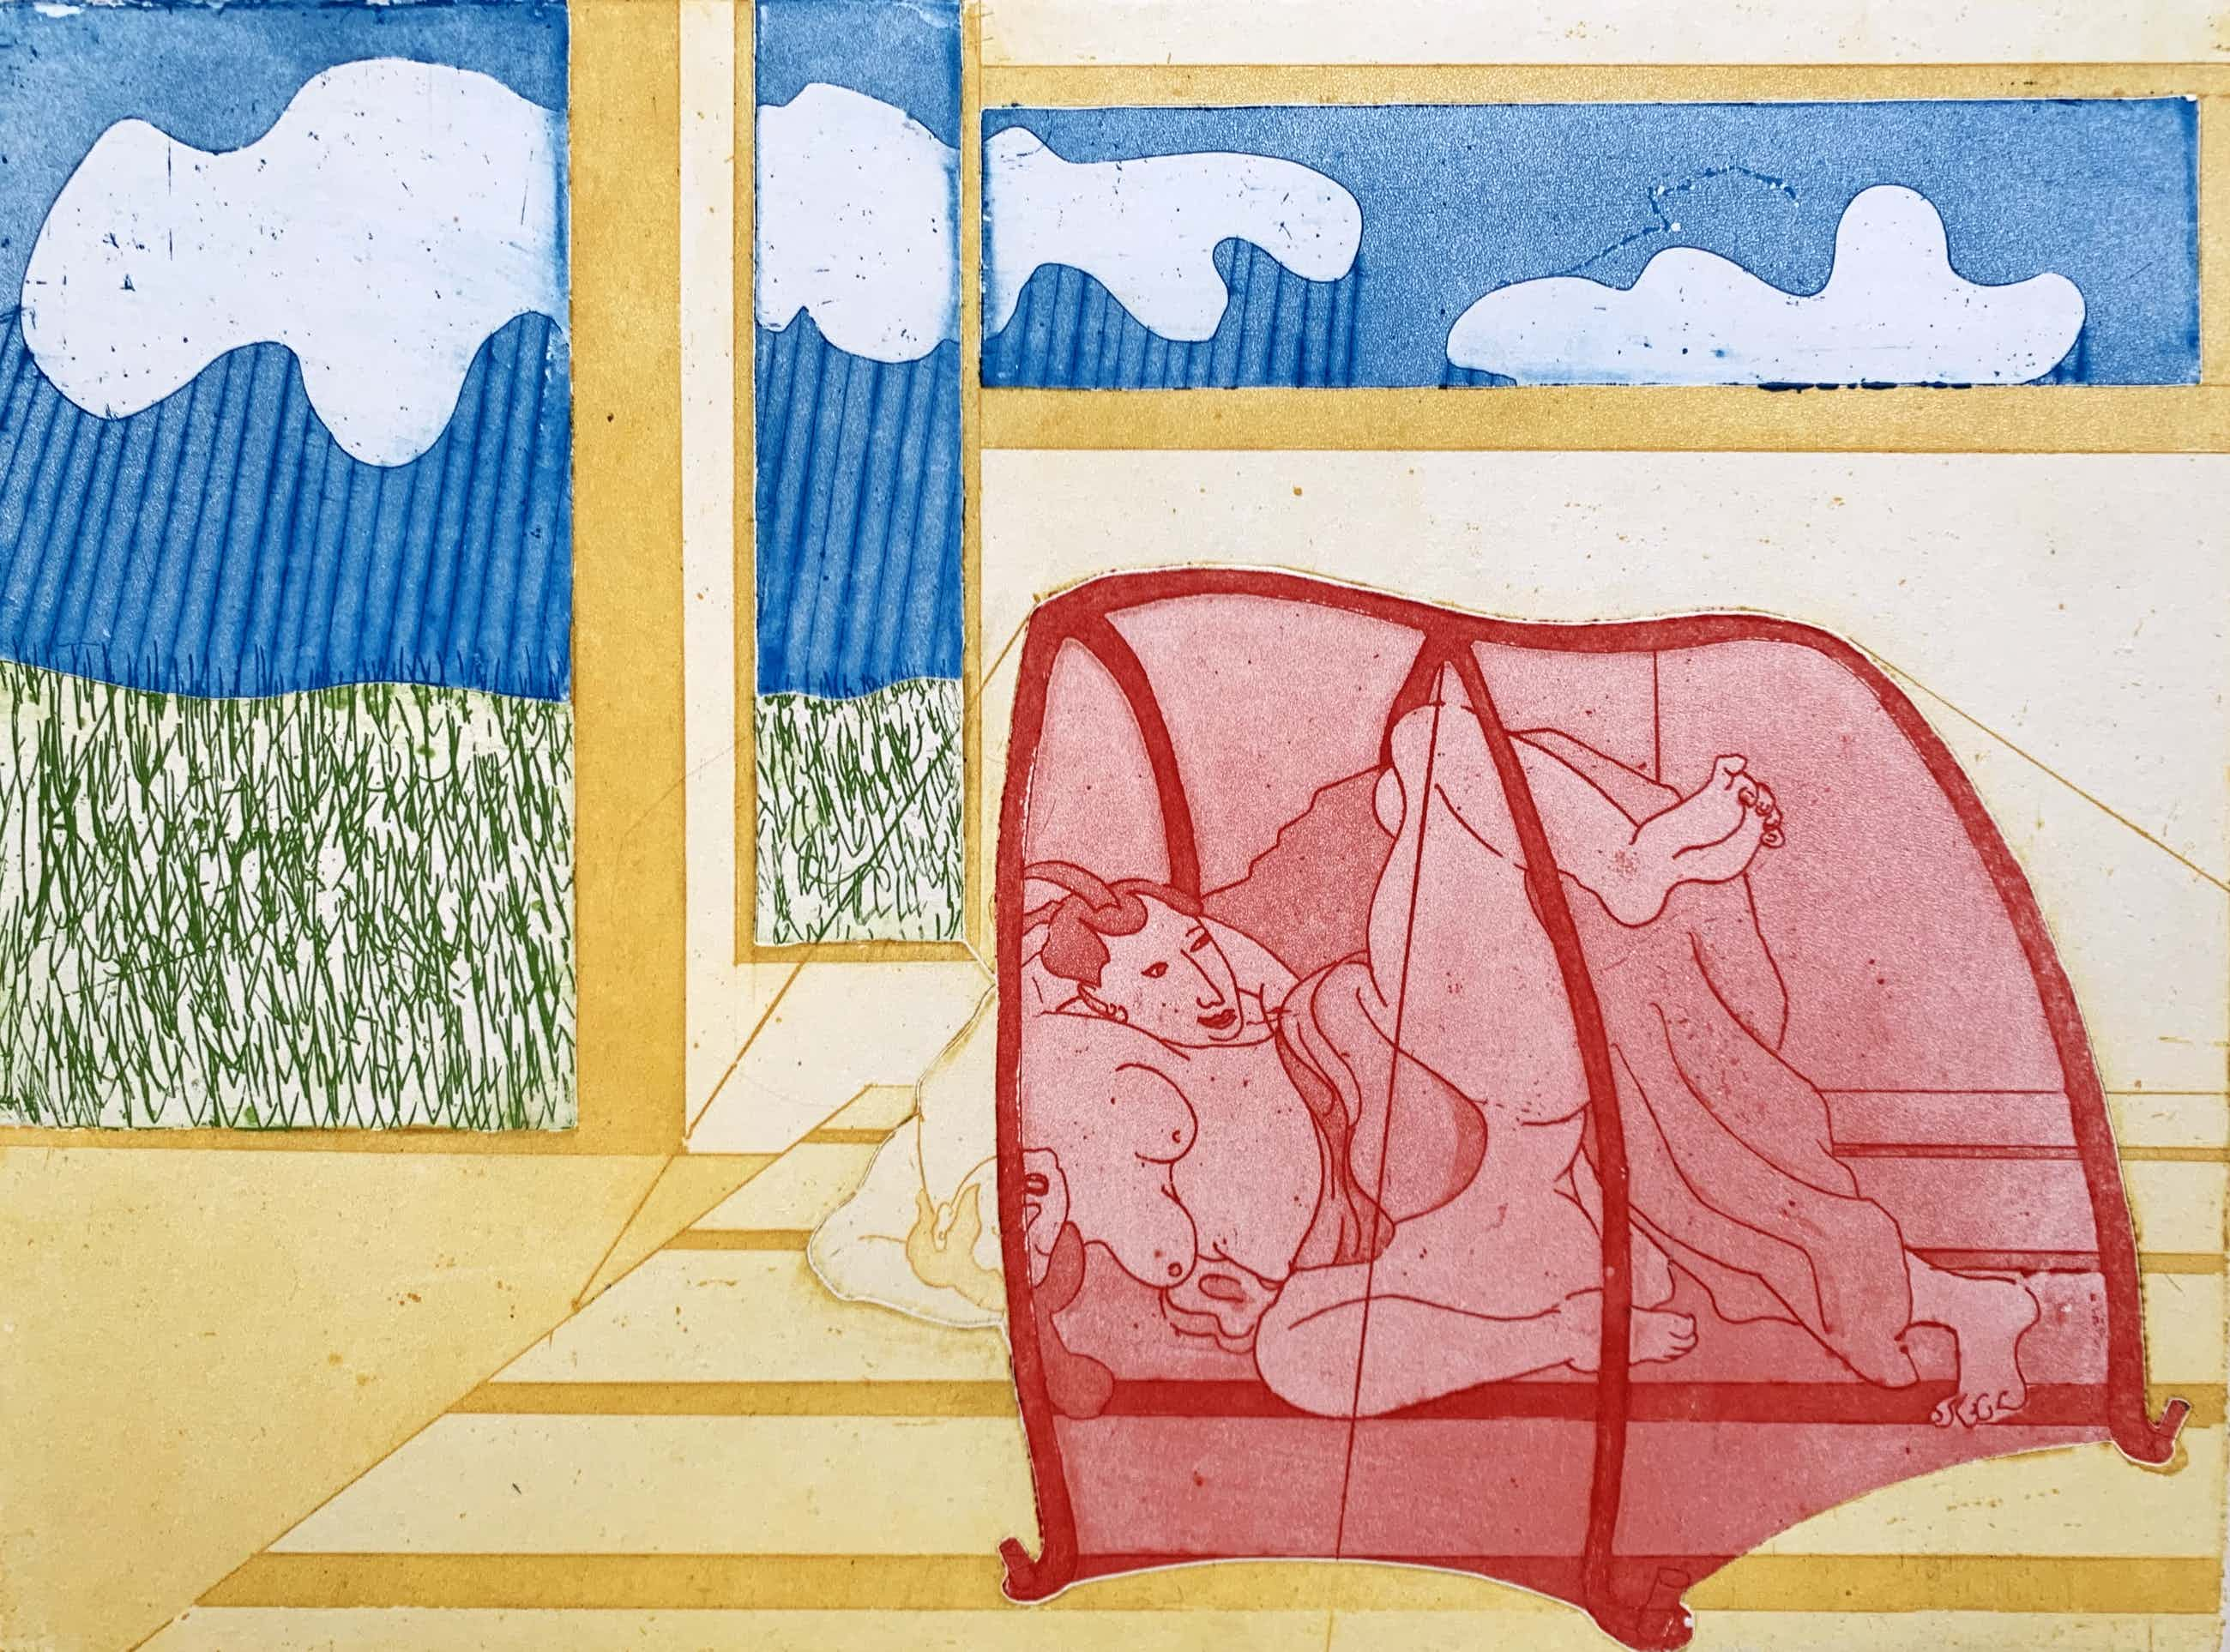 Sjoerd Bakker - kleurenets - 'Japanse minnaars in lust' - 1969 (Zeer kleine oplage) kopen? Bied vanaf 65!